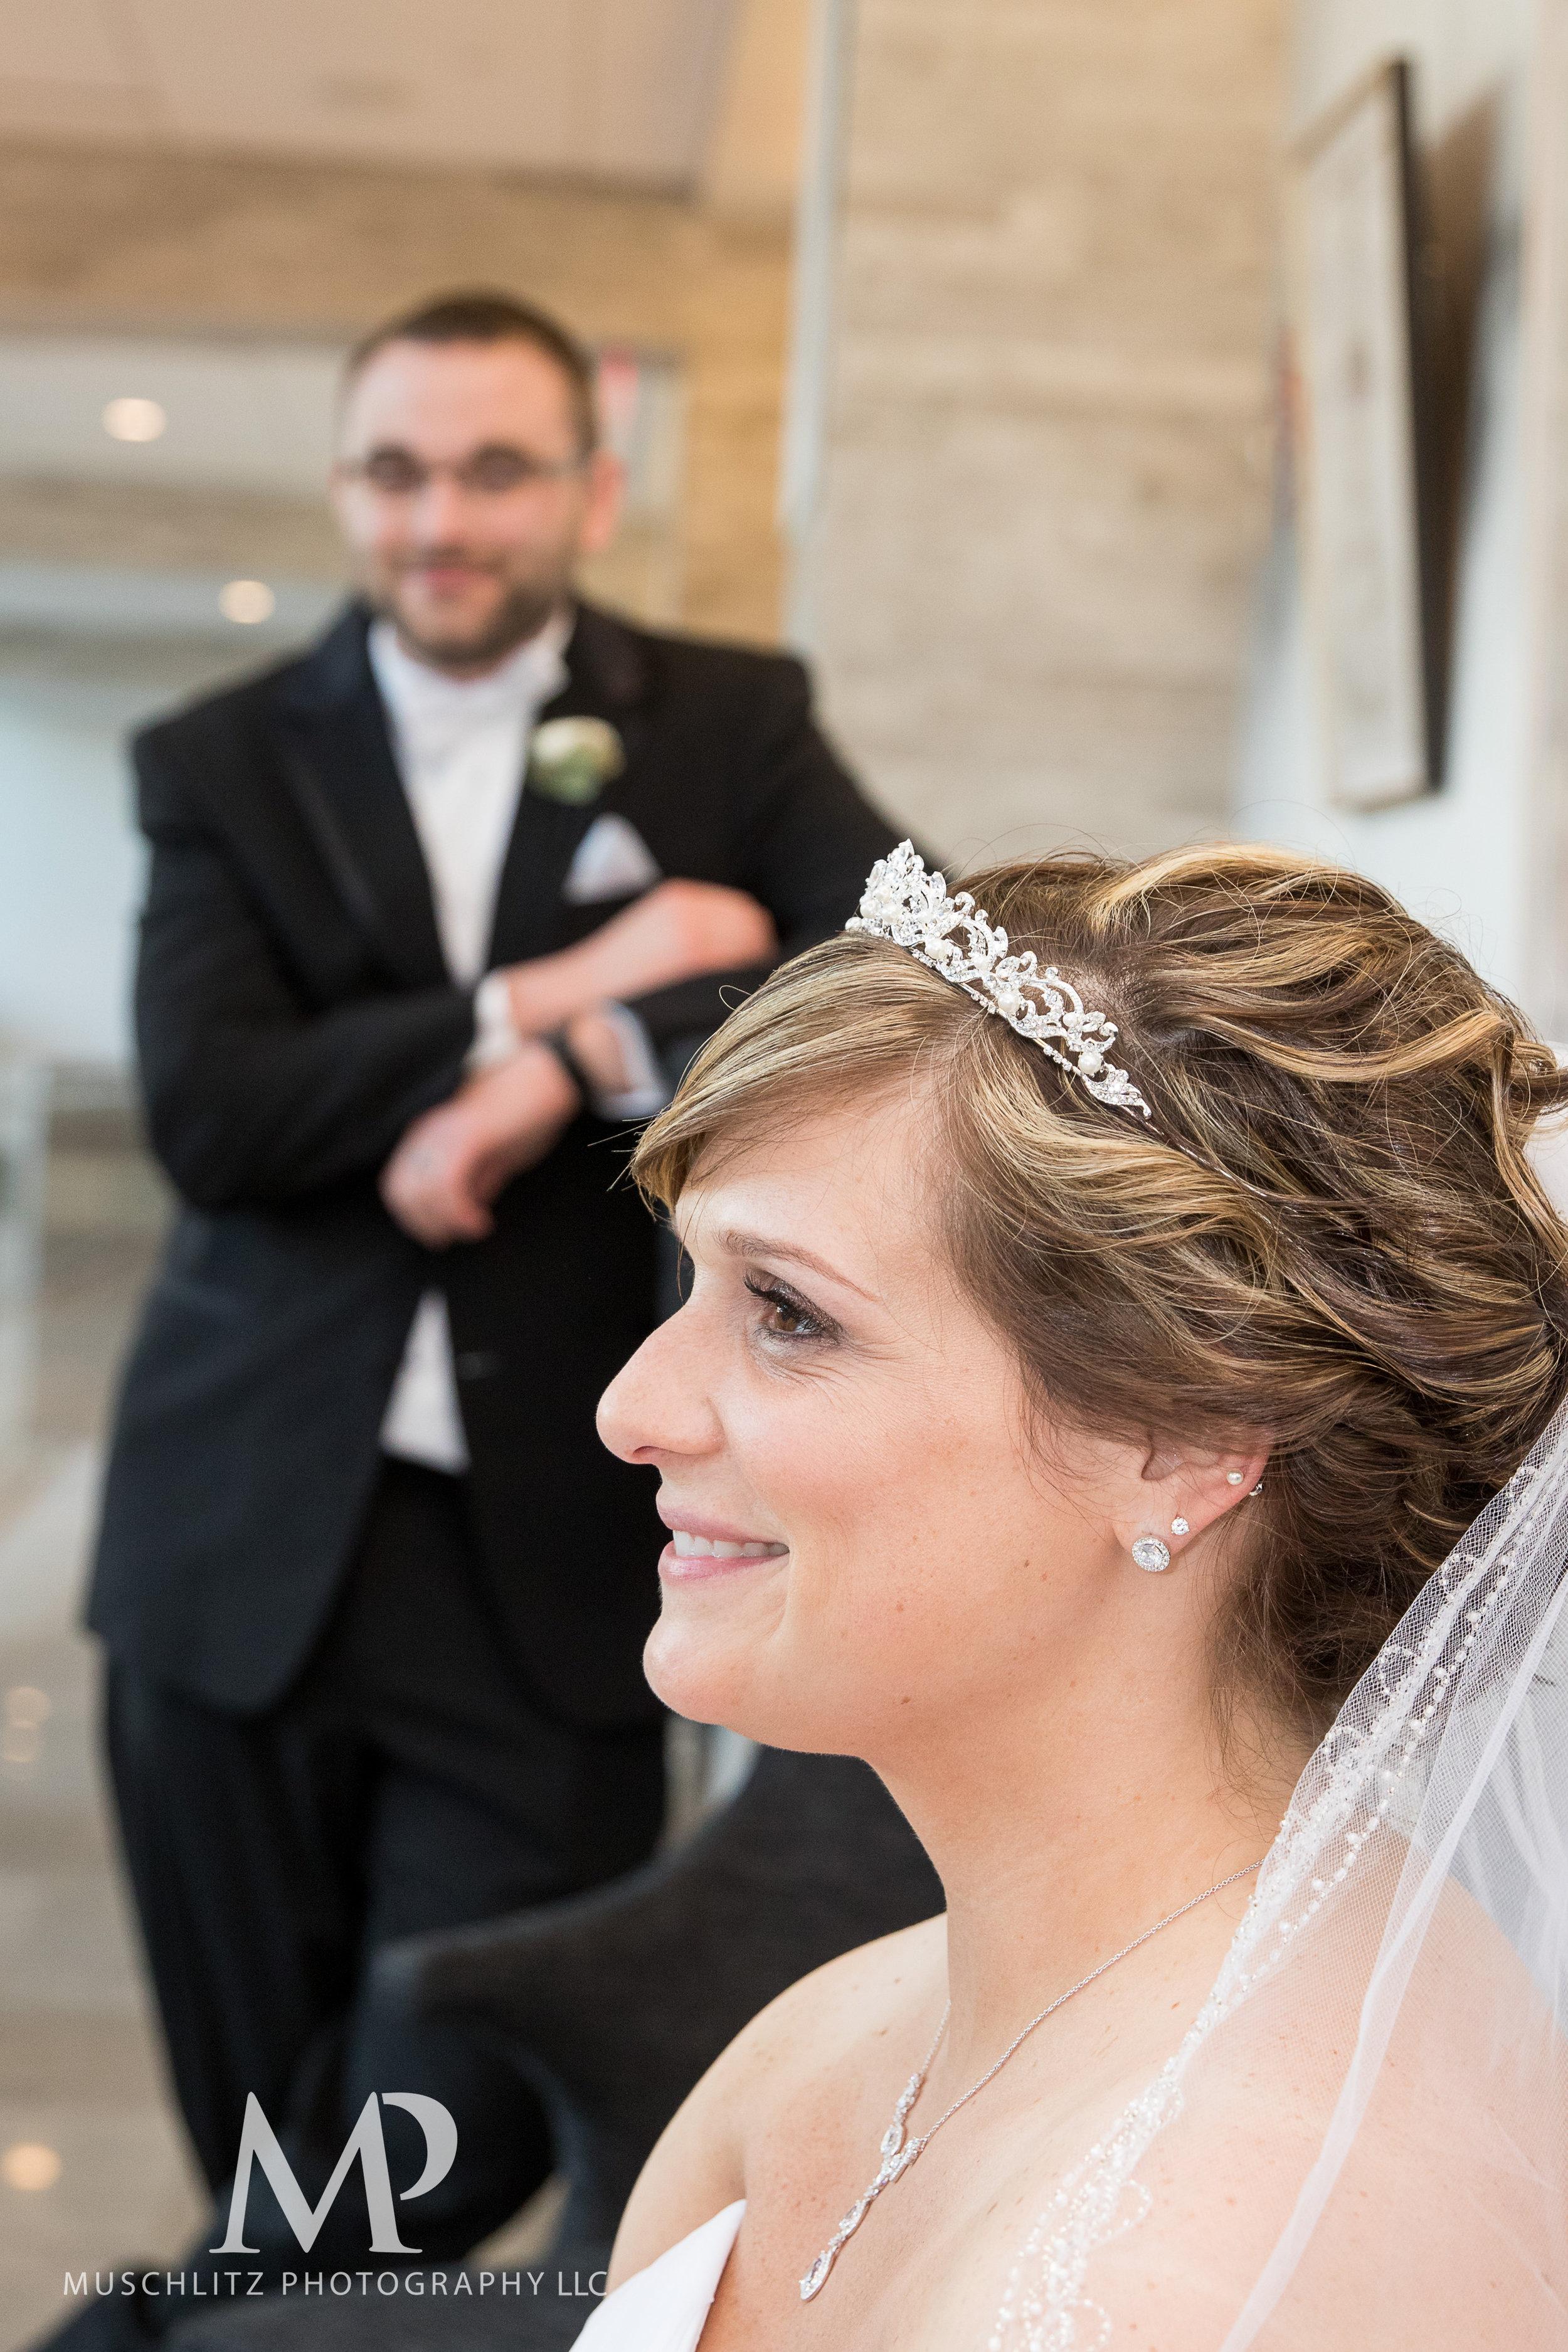 the hilton-columbus-wedding-portraits-downtown-columbus-ohio-muschlitz-photography-016.JPG